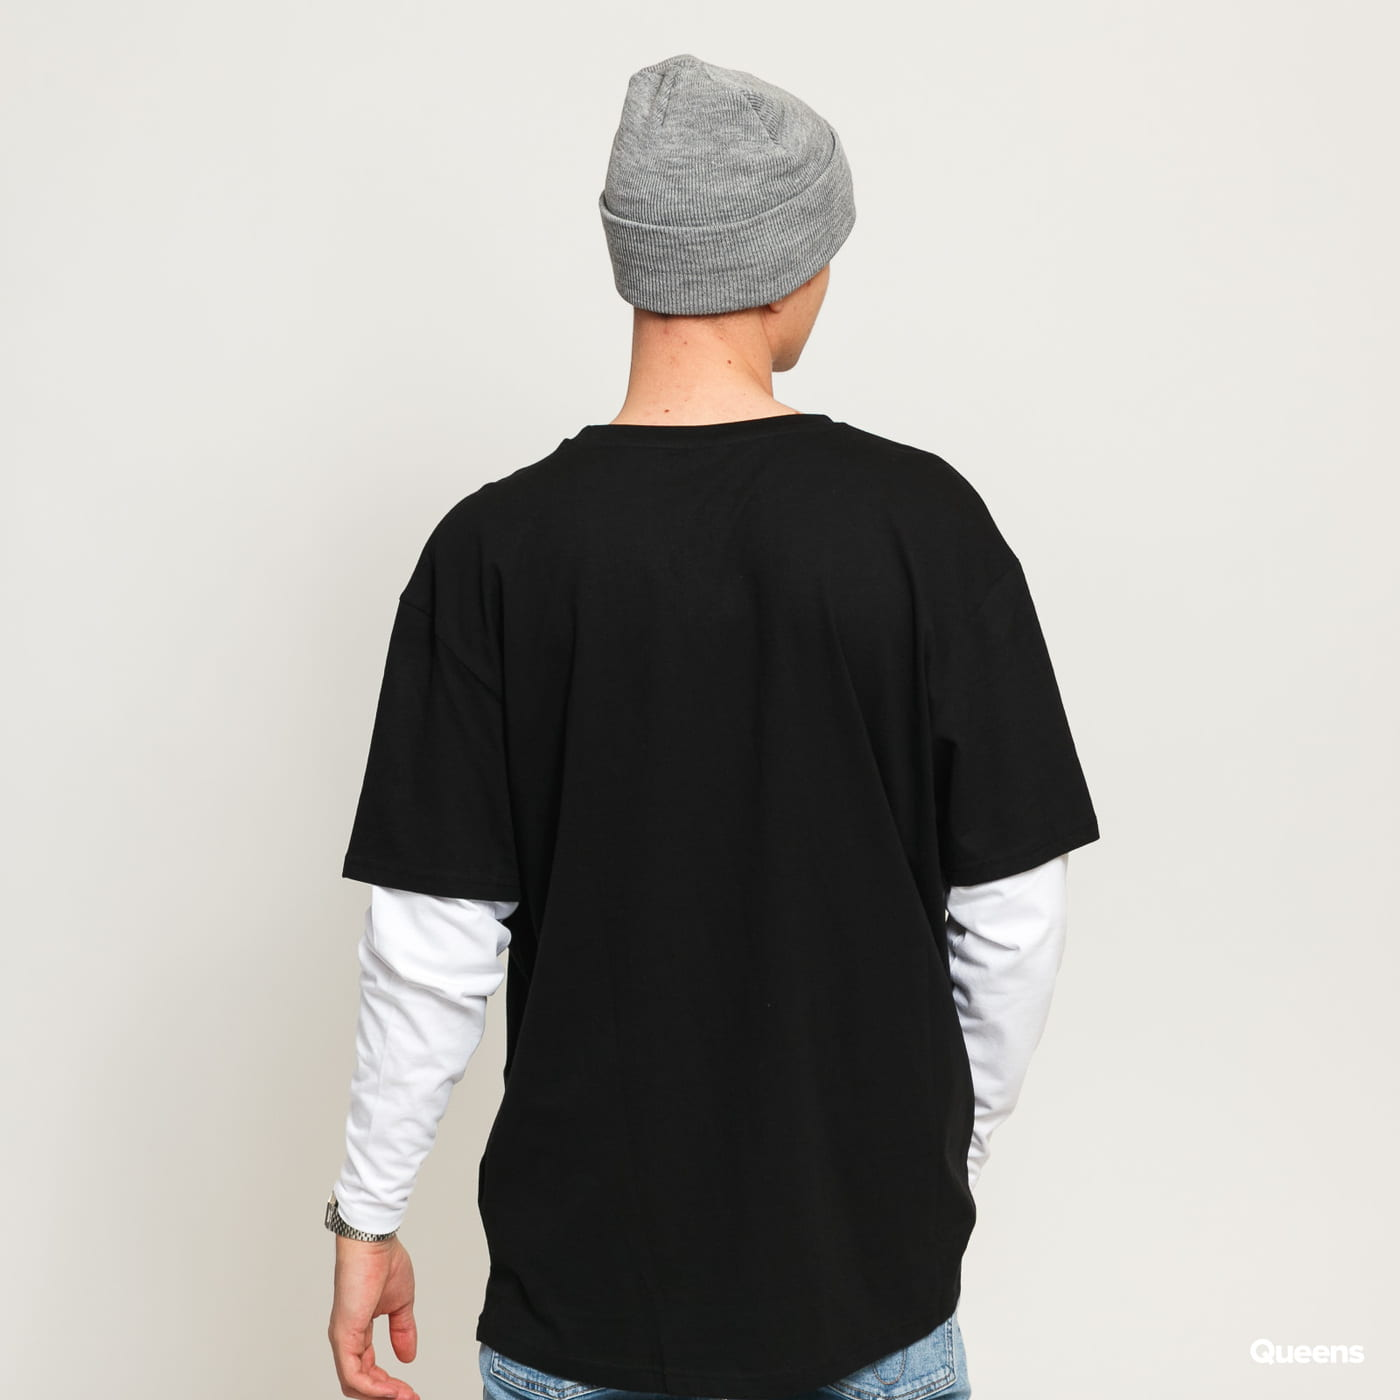 Urban Classics Oversized Shaped Double Layer LS Tee černé / bílé